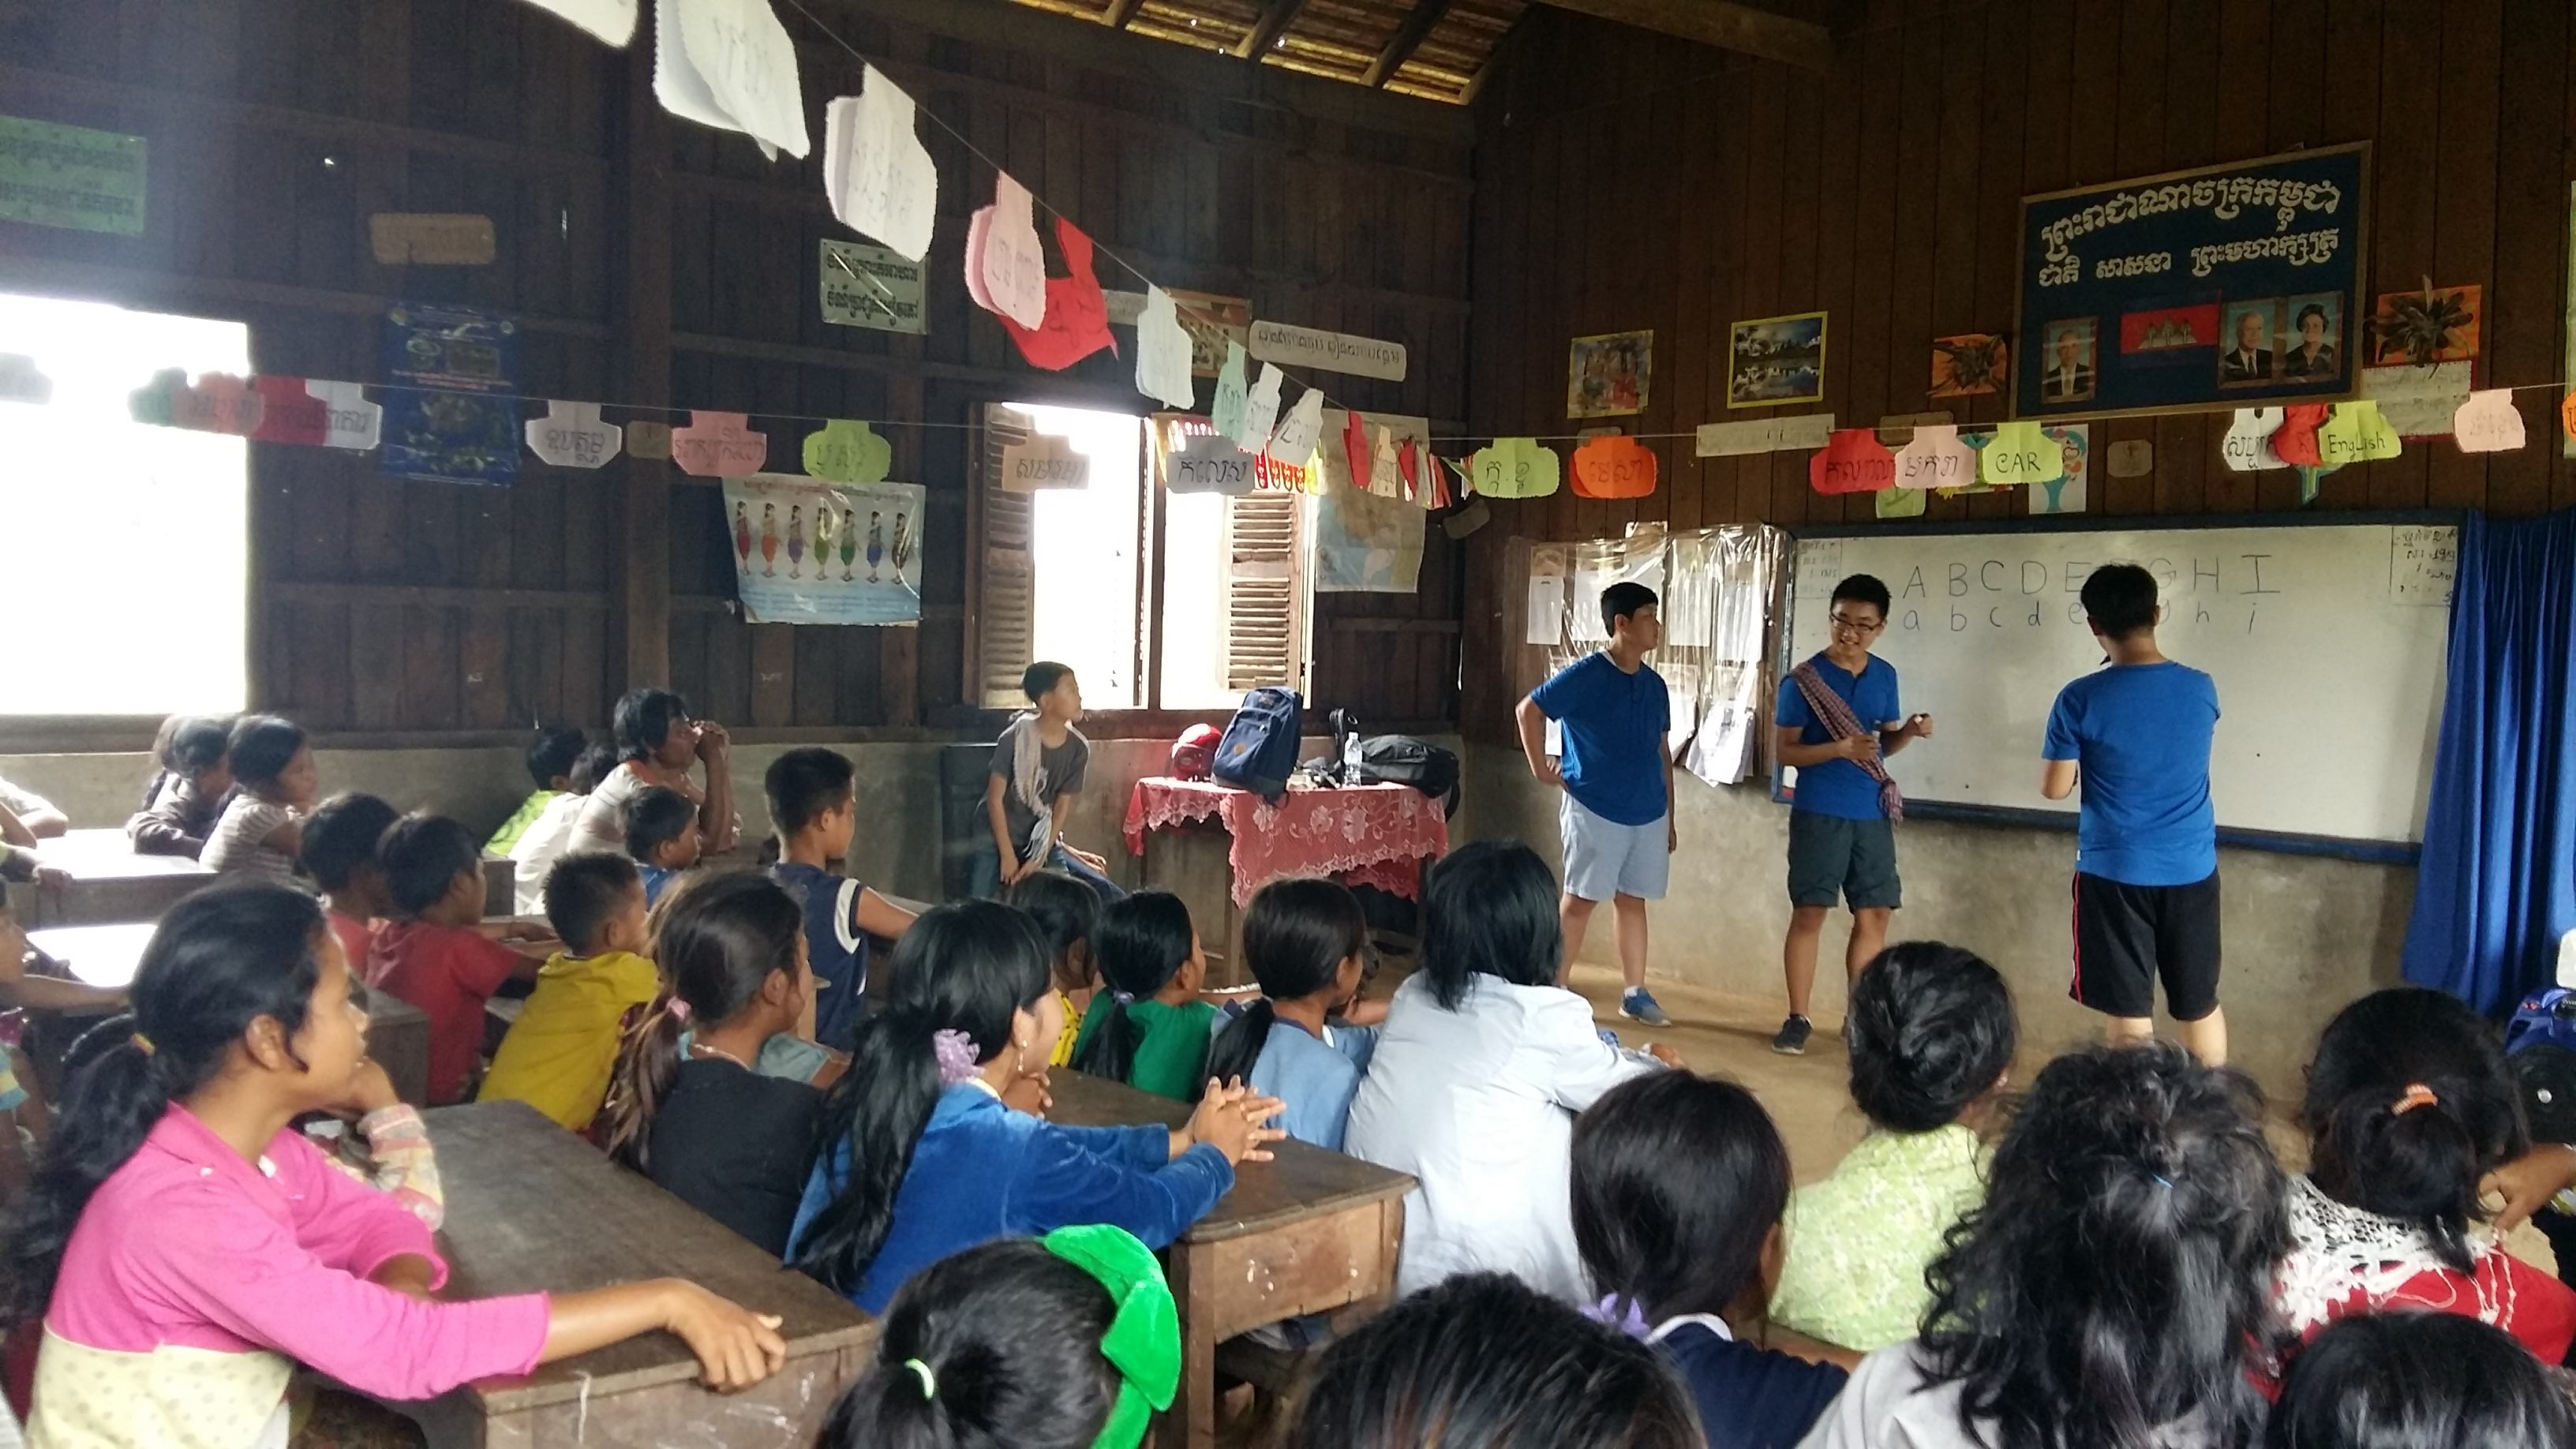 149d99512ce 2017 캄보디아 아웃리치   Cambodia Outreach - 밴쿠버 GDEW 열방교회